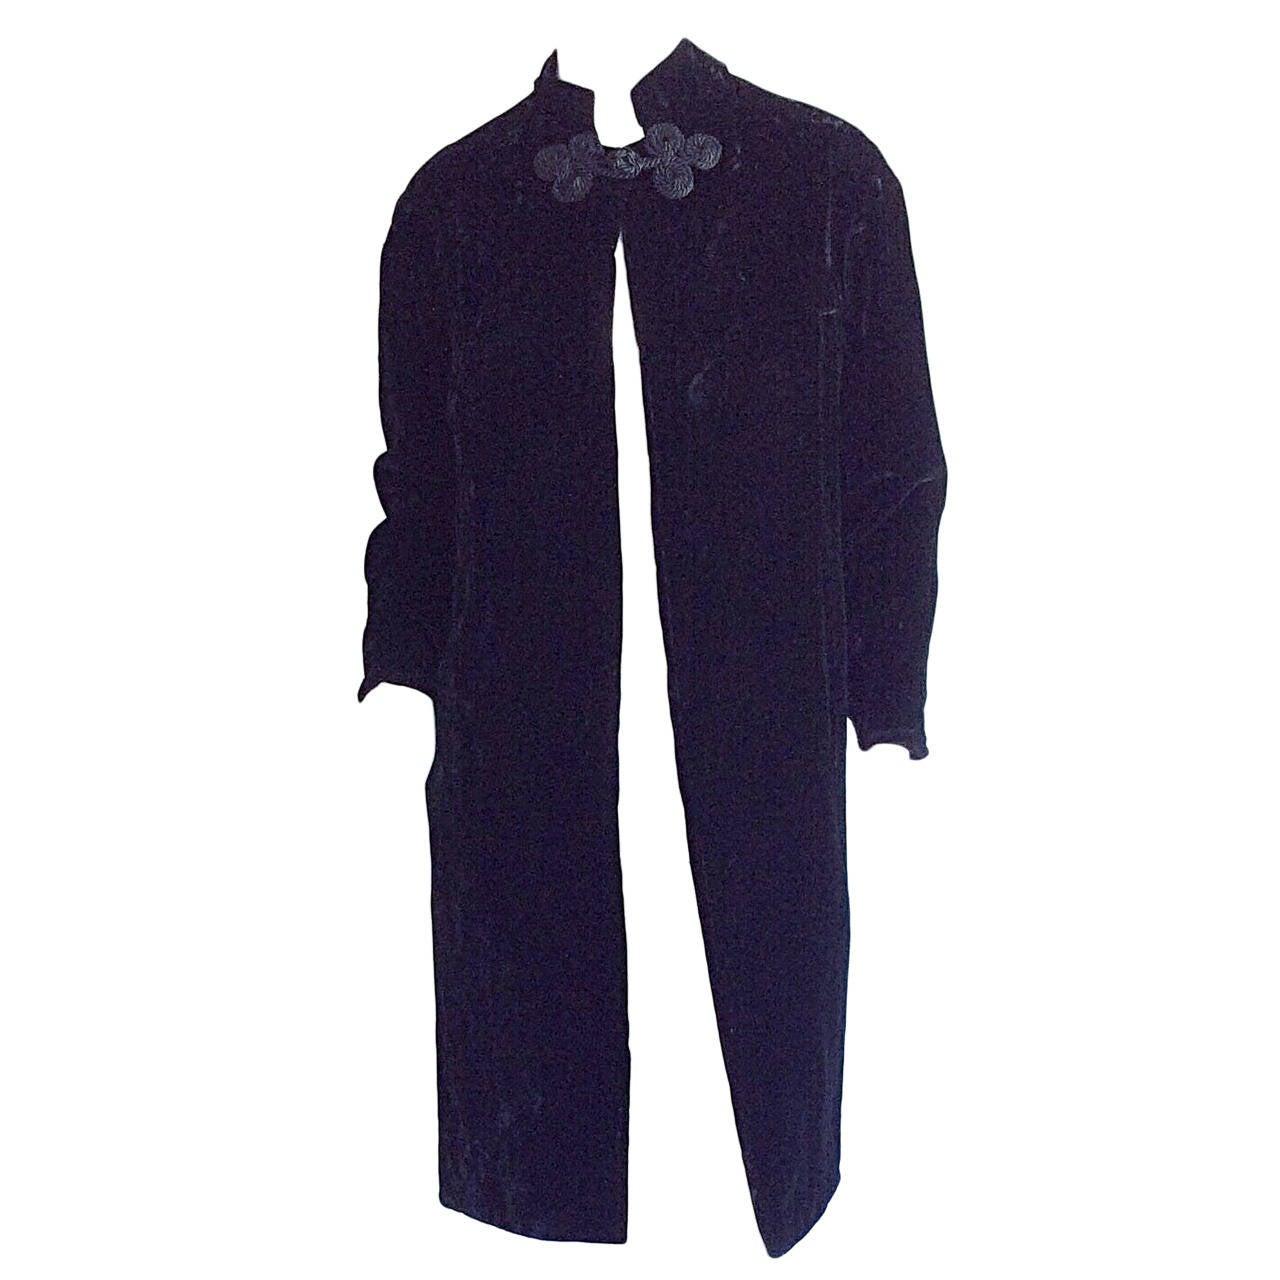 Extremely Rare 1950s Ceil Chapman Black Velvet Milium Cloak Jacket 1